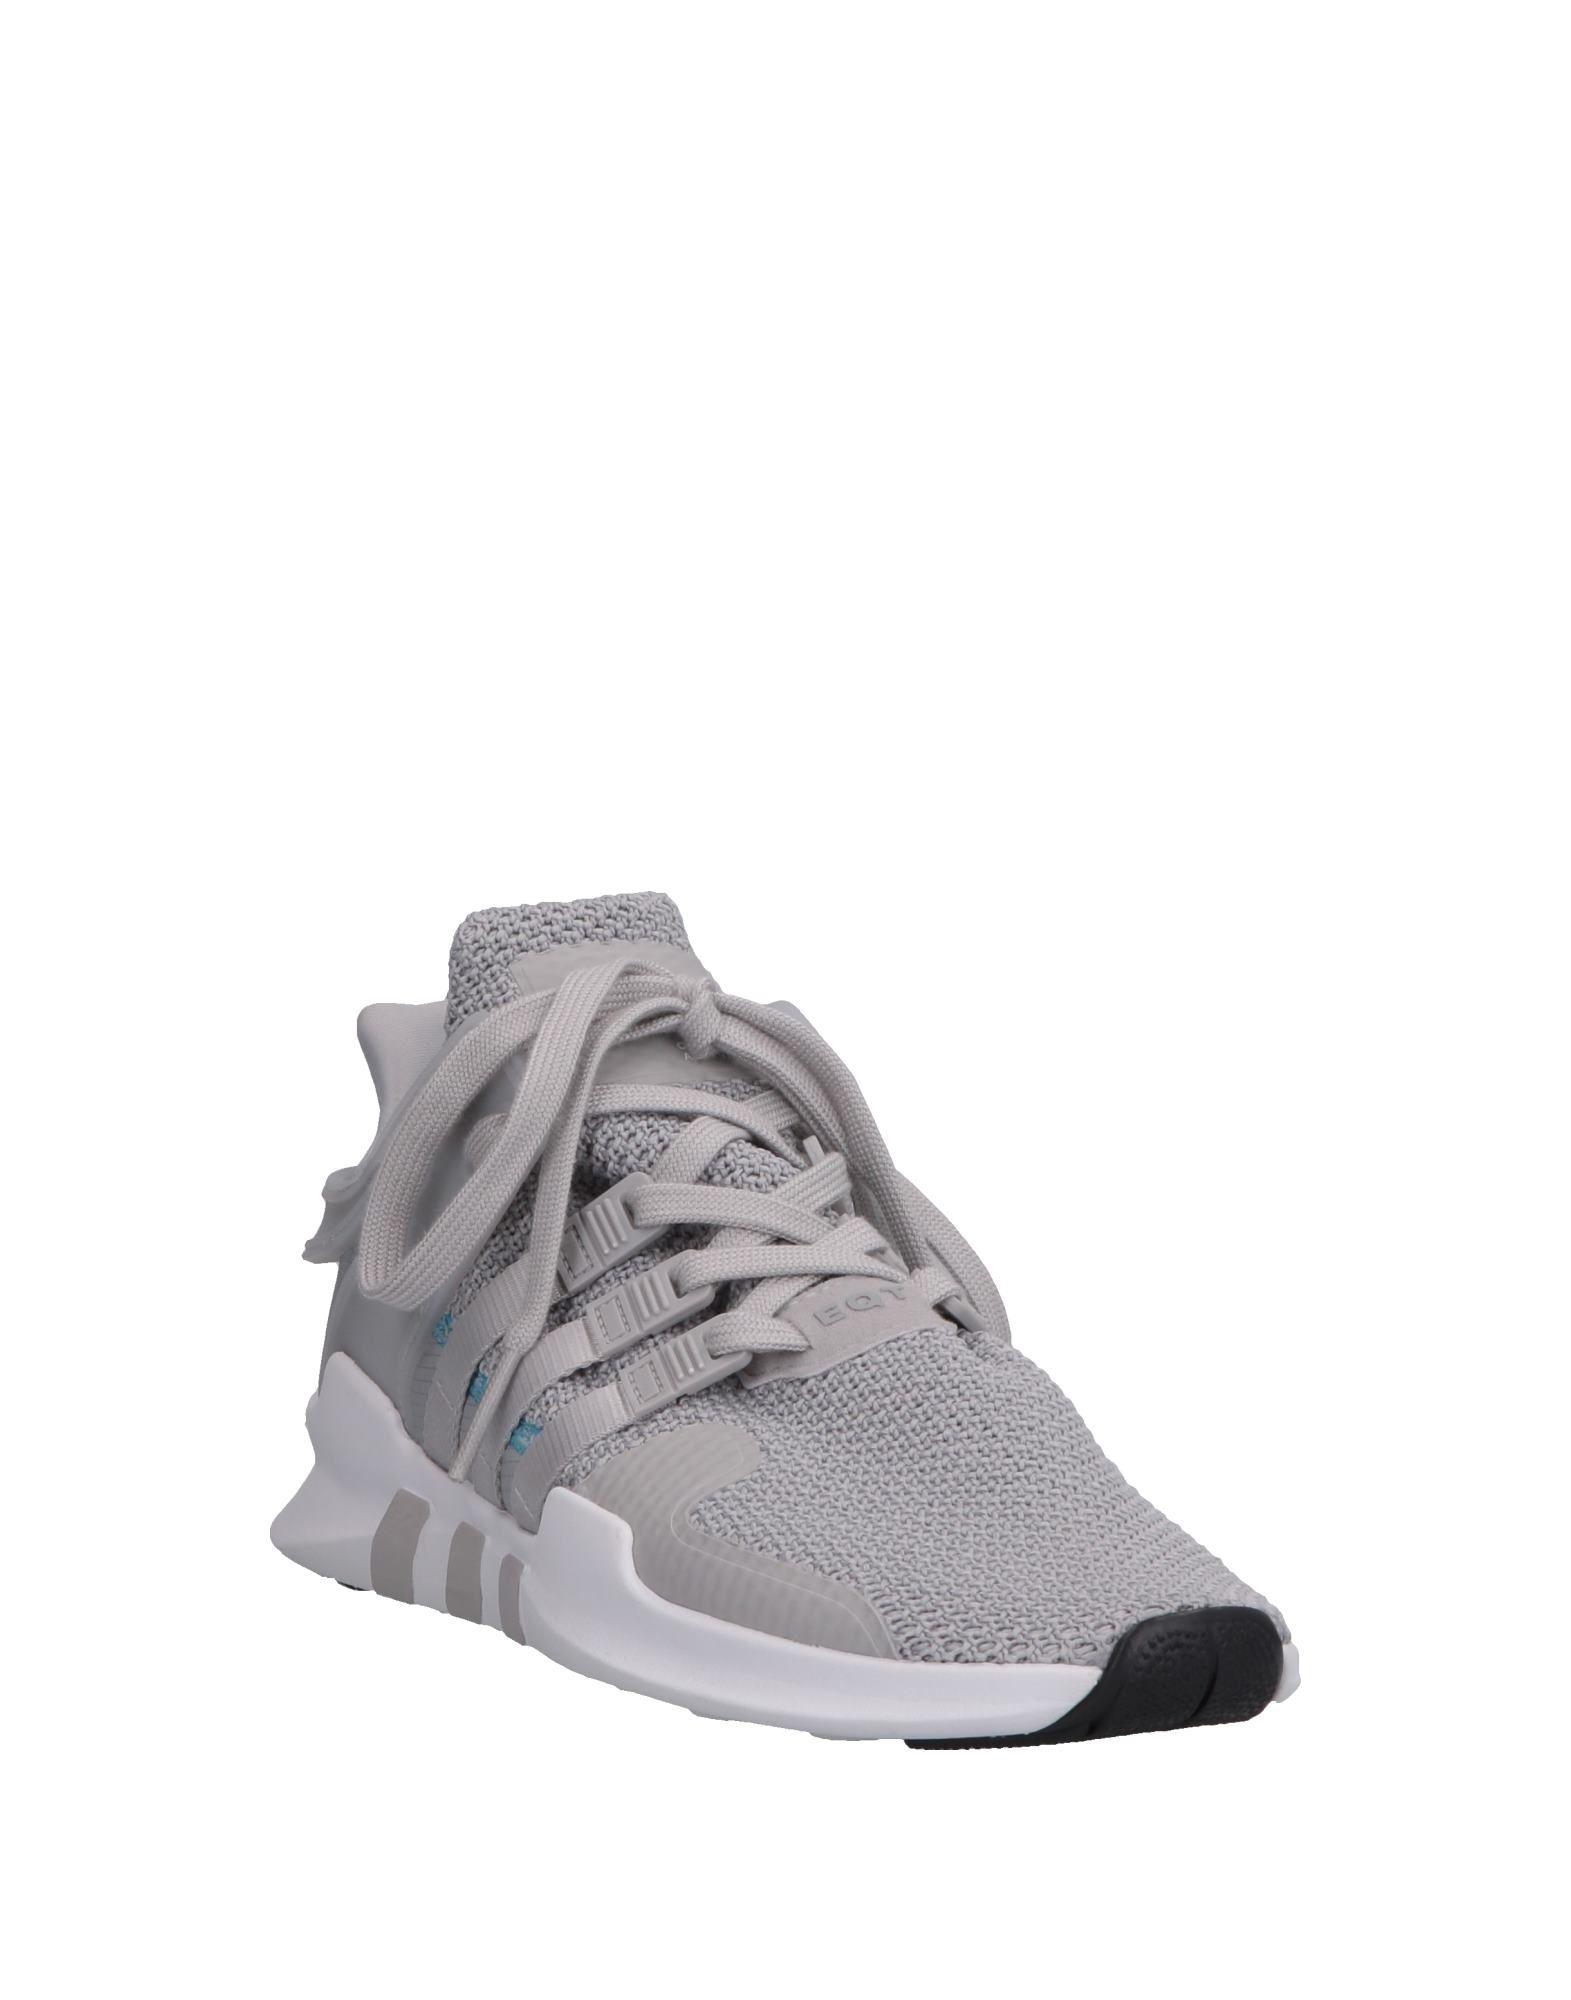 Adidas Originals Sneakers - Men Adidas Originals Originals Originals Sneakers online on  Australia - 11563241RB 9cf740